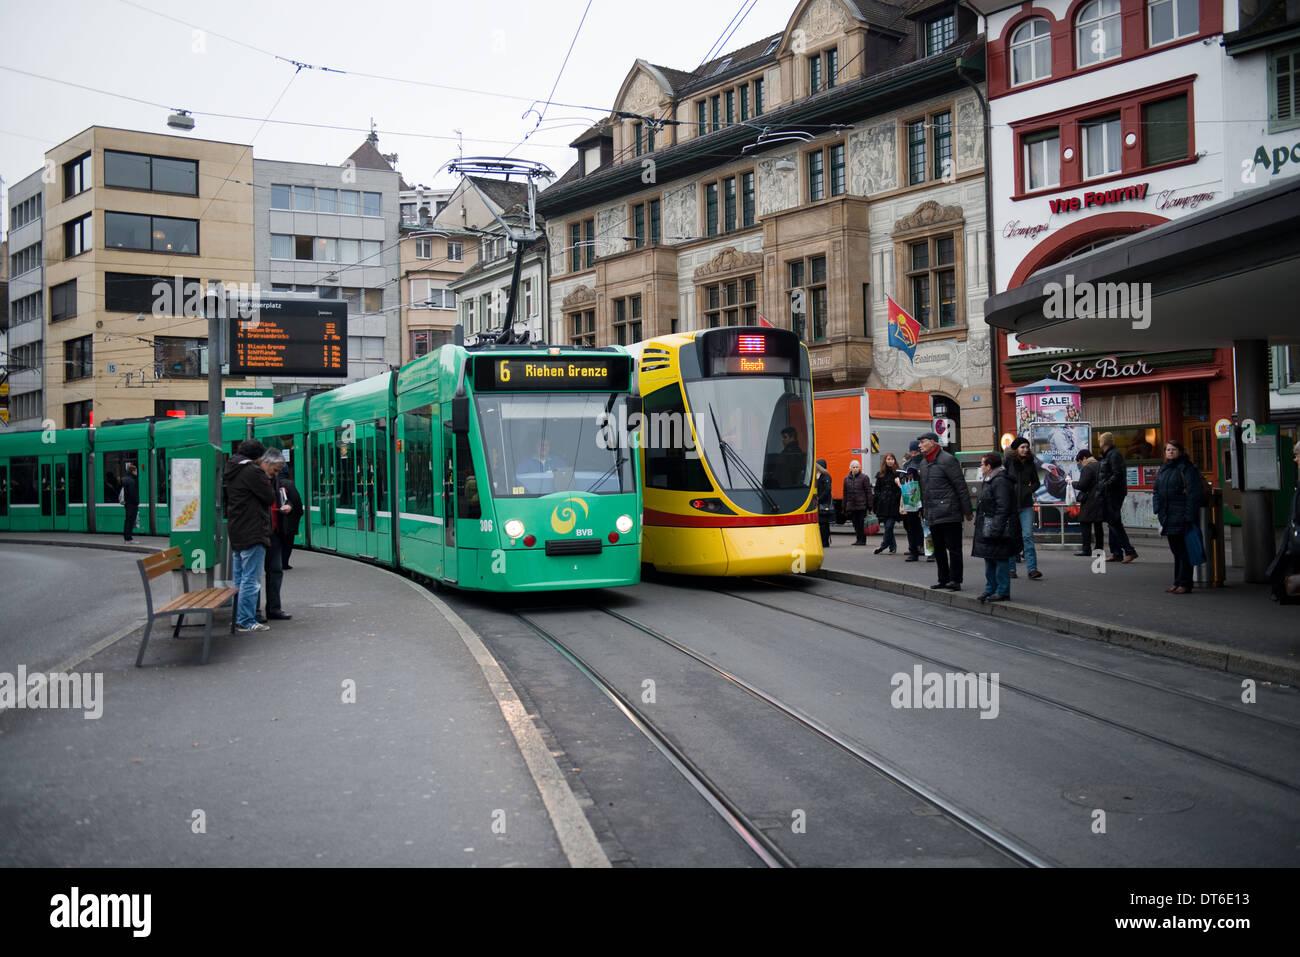 BVB & BLT Trams at Barfusserplatz, Basel, Switzerland -1 - Stock Image